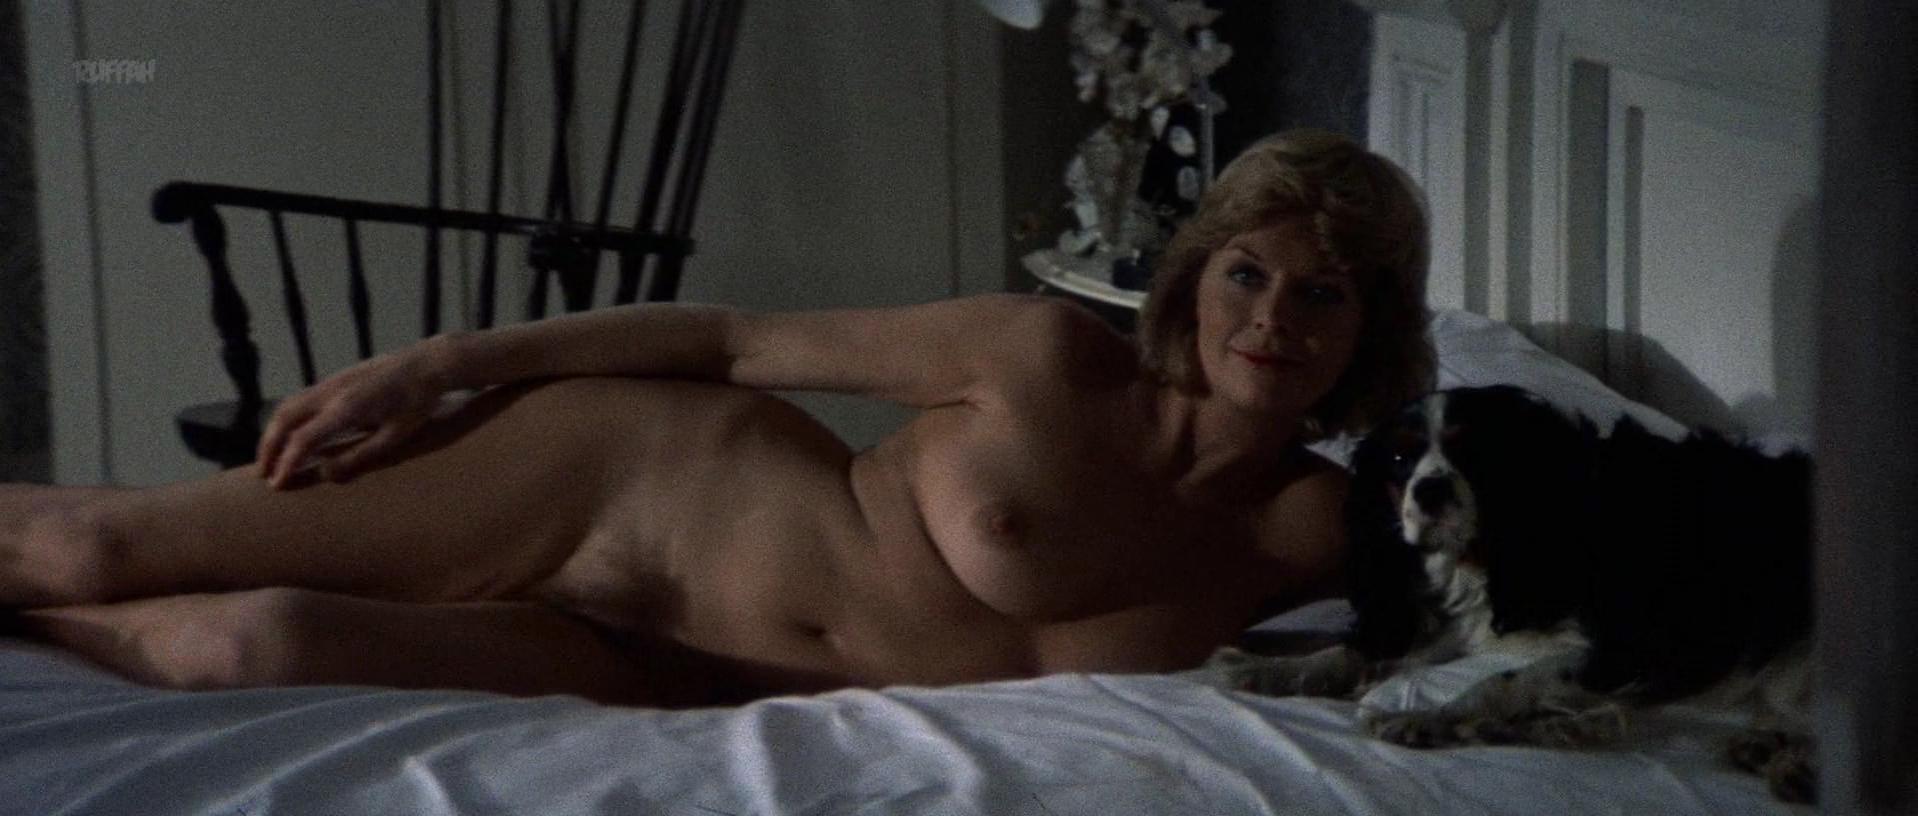 Susannah York nude - Images (1972)